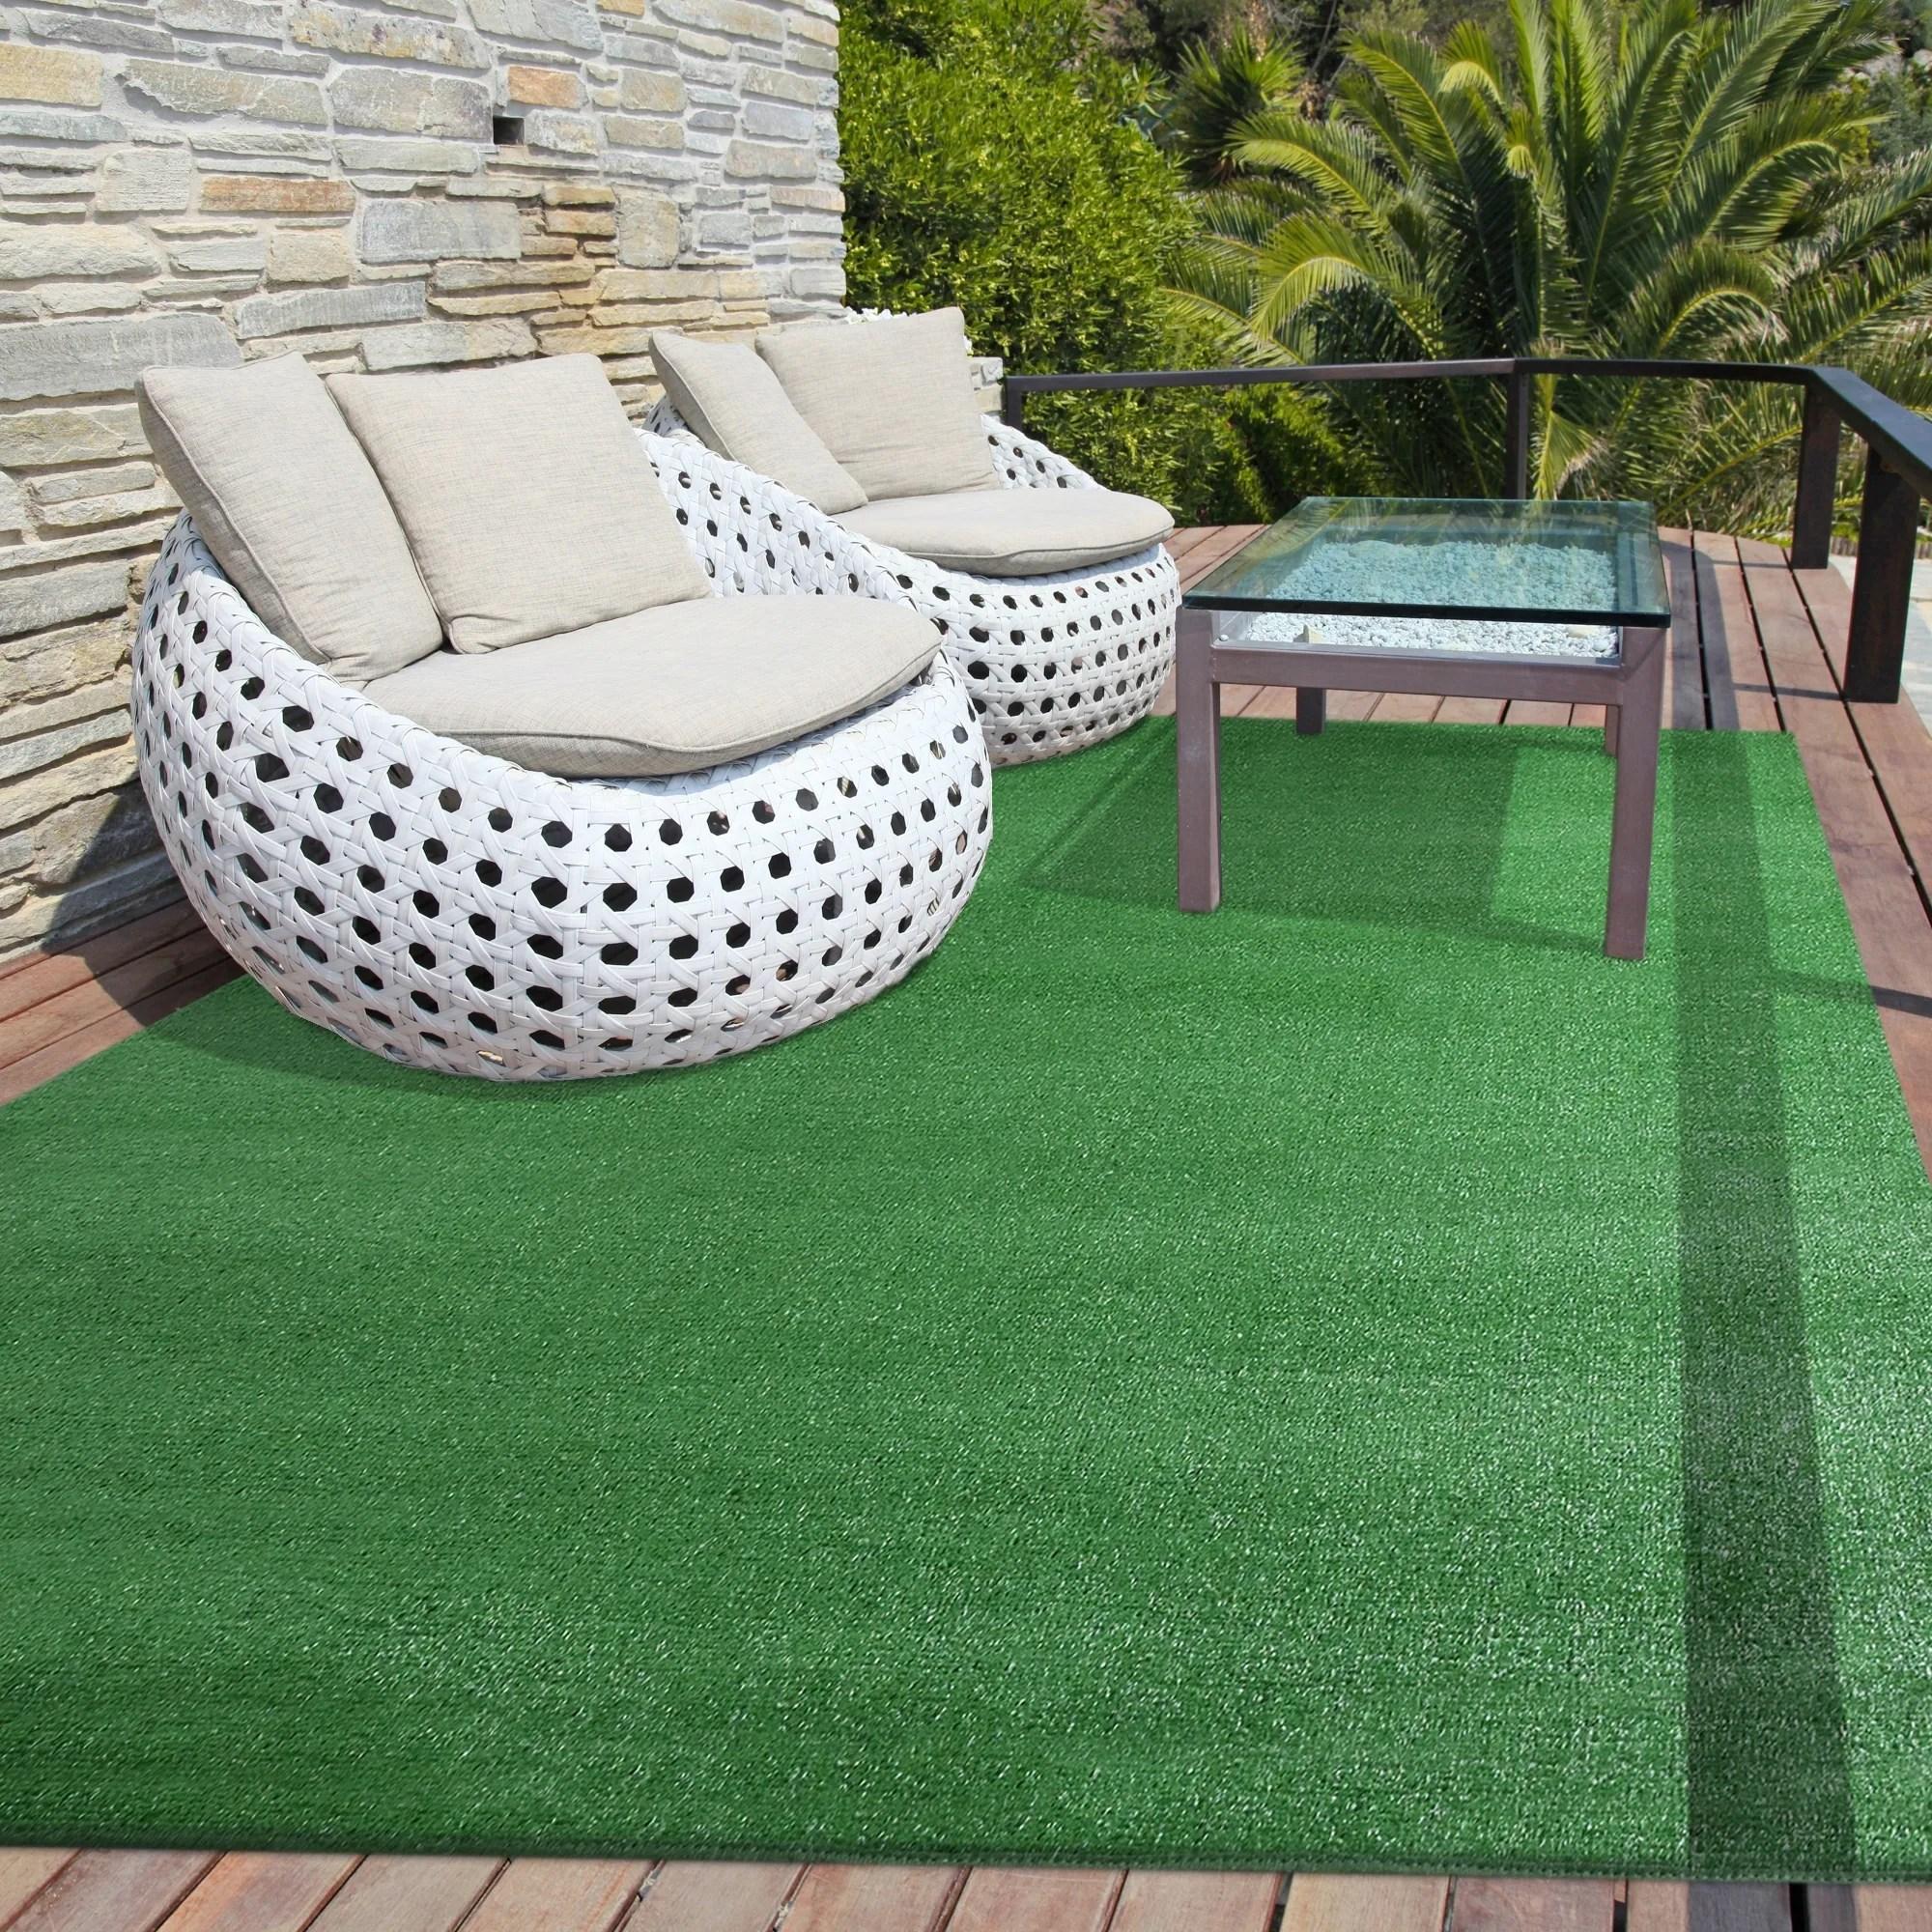 icustomrug outdoor artificial turf rug in green